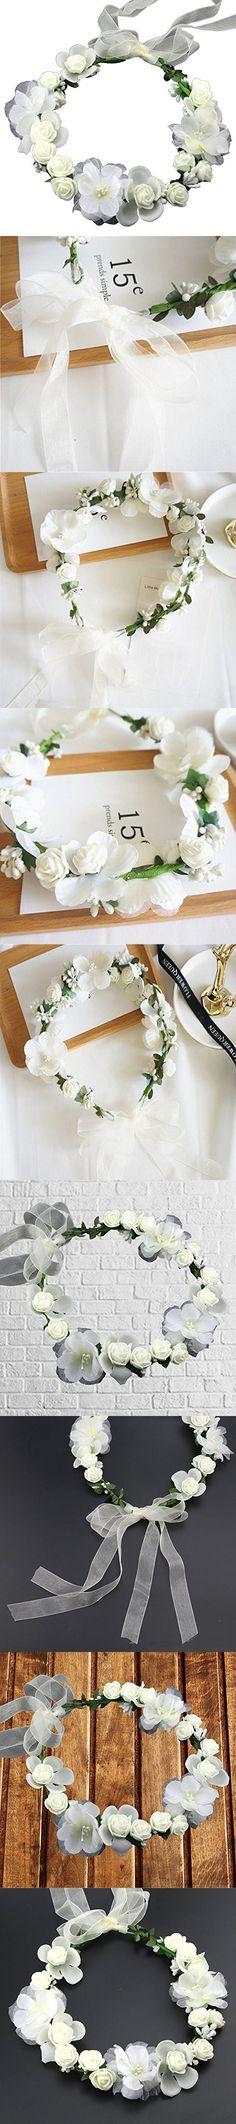 Women White Bridal Handmade Flower Crown with Adjustable Ribbon Wedding Festivals Floral Wreath Halo Headband Floral Garland